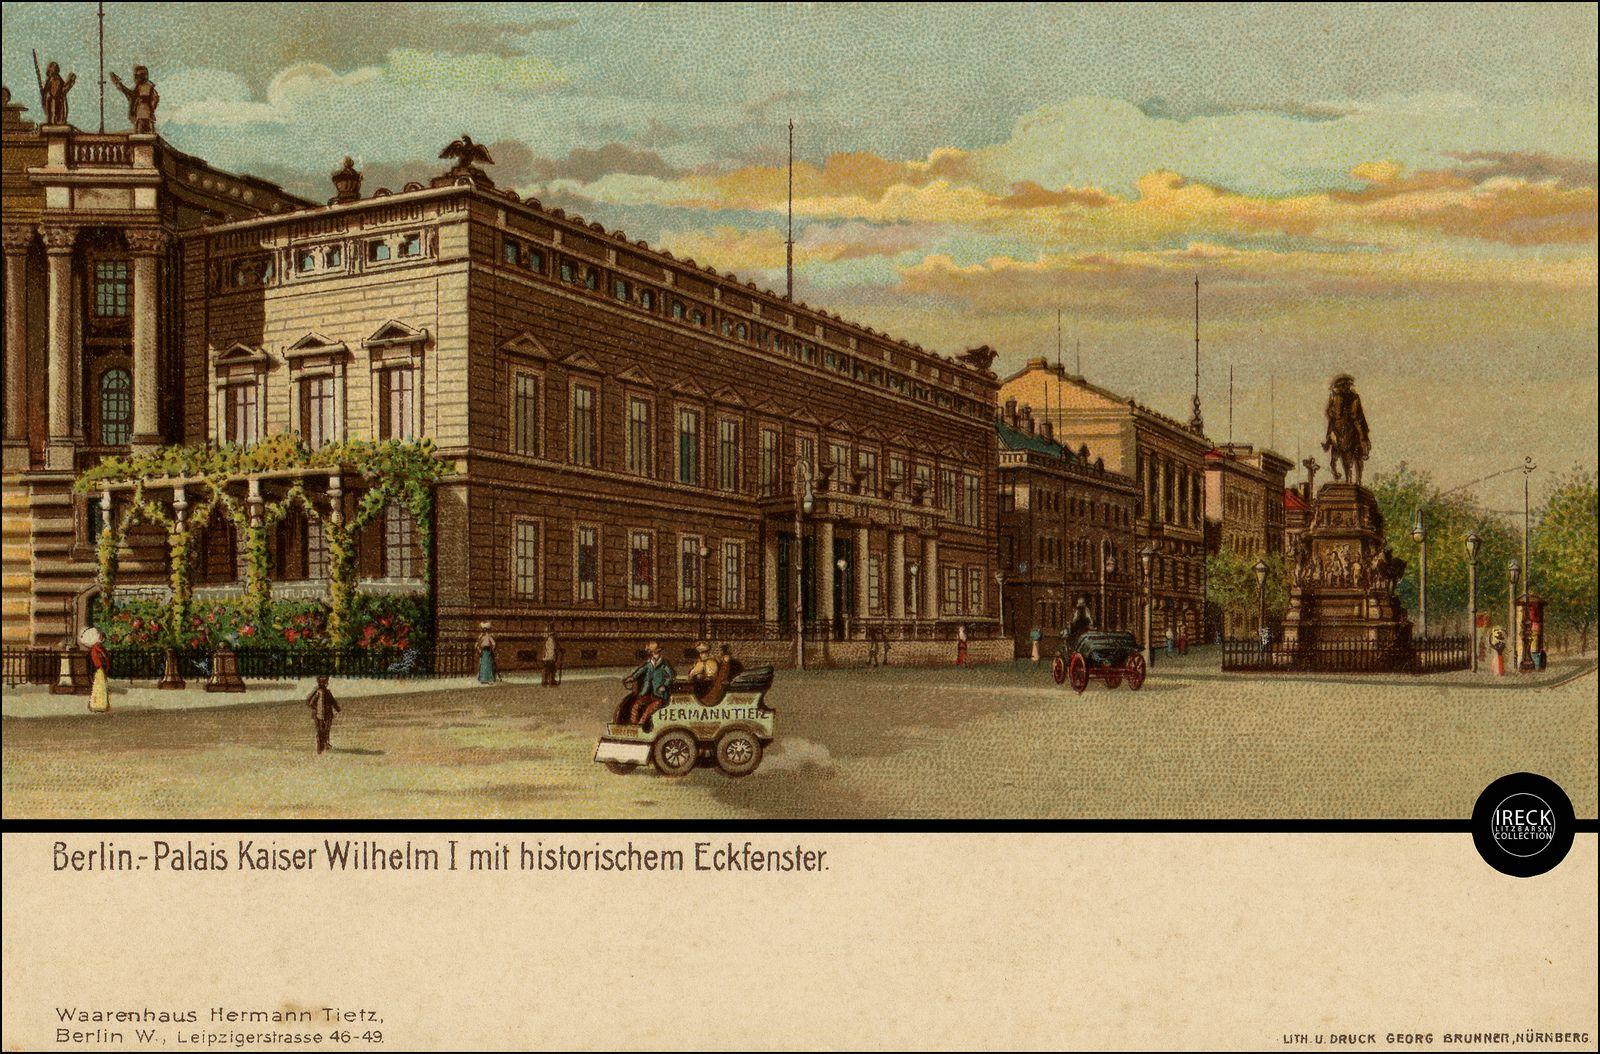 Berlin - Palais Kaiser Wilhelm I. (Altes Palais) - Werbung Warenhaus Hermann Tietz ca 1905